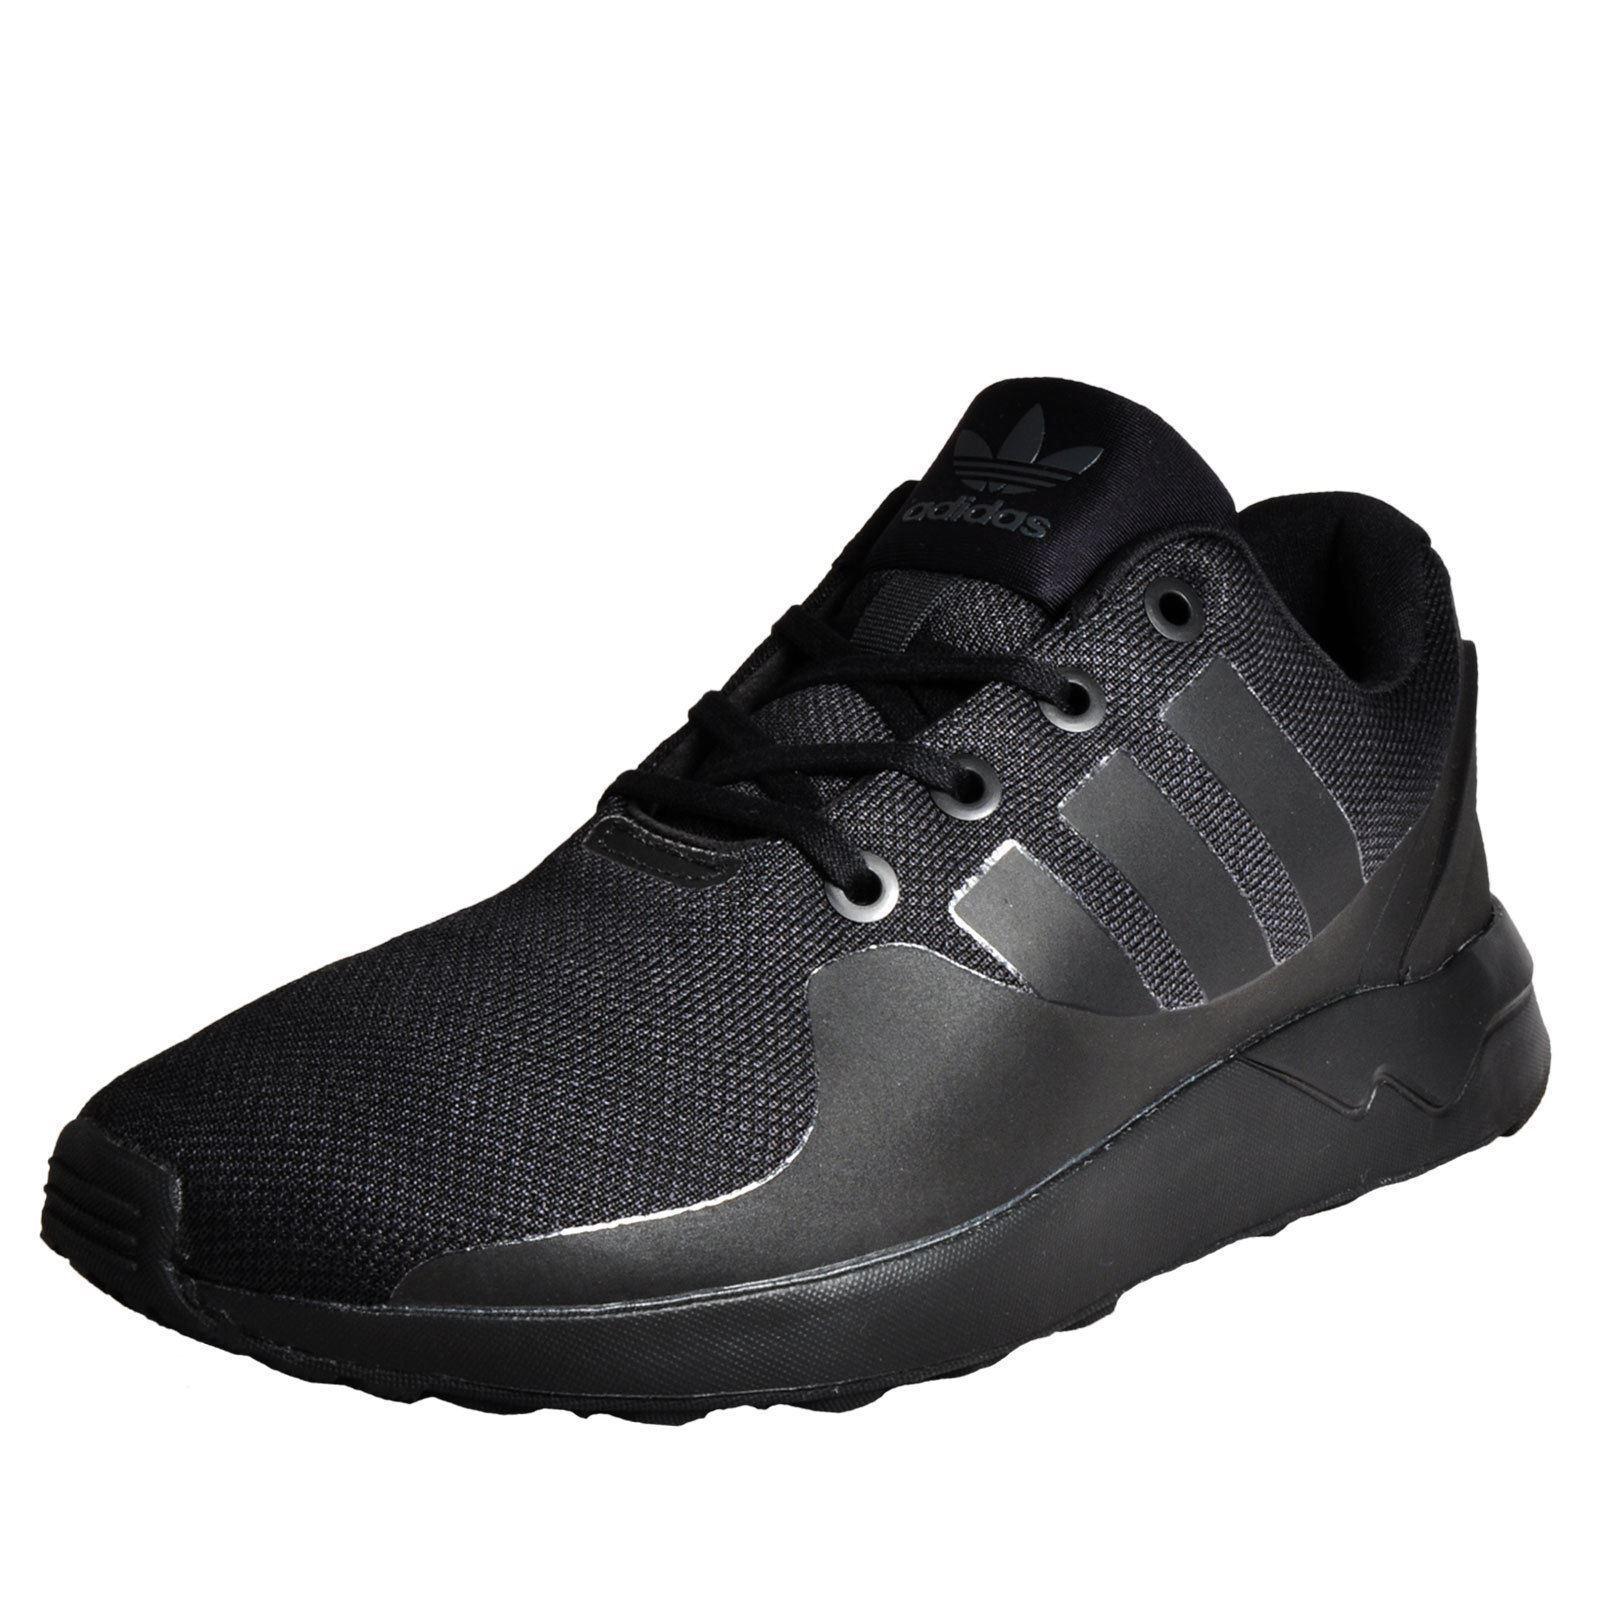 adidas Originals ZX Flux ADV Tech Trainers Mens Black Sneakers Shoes Footwear